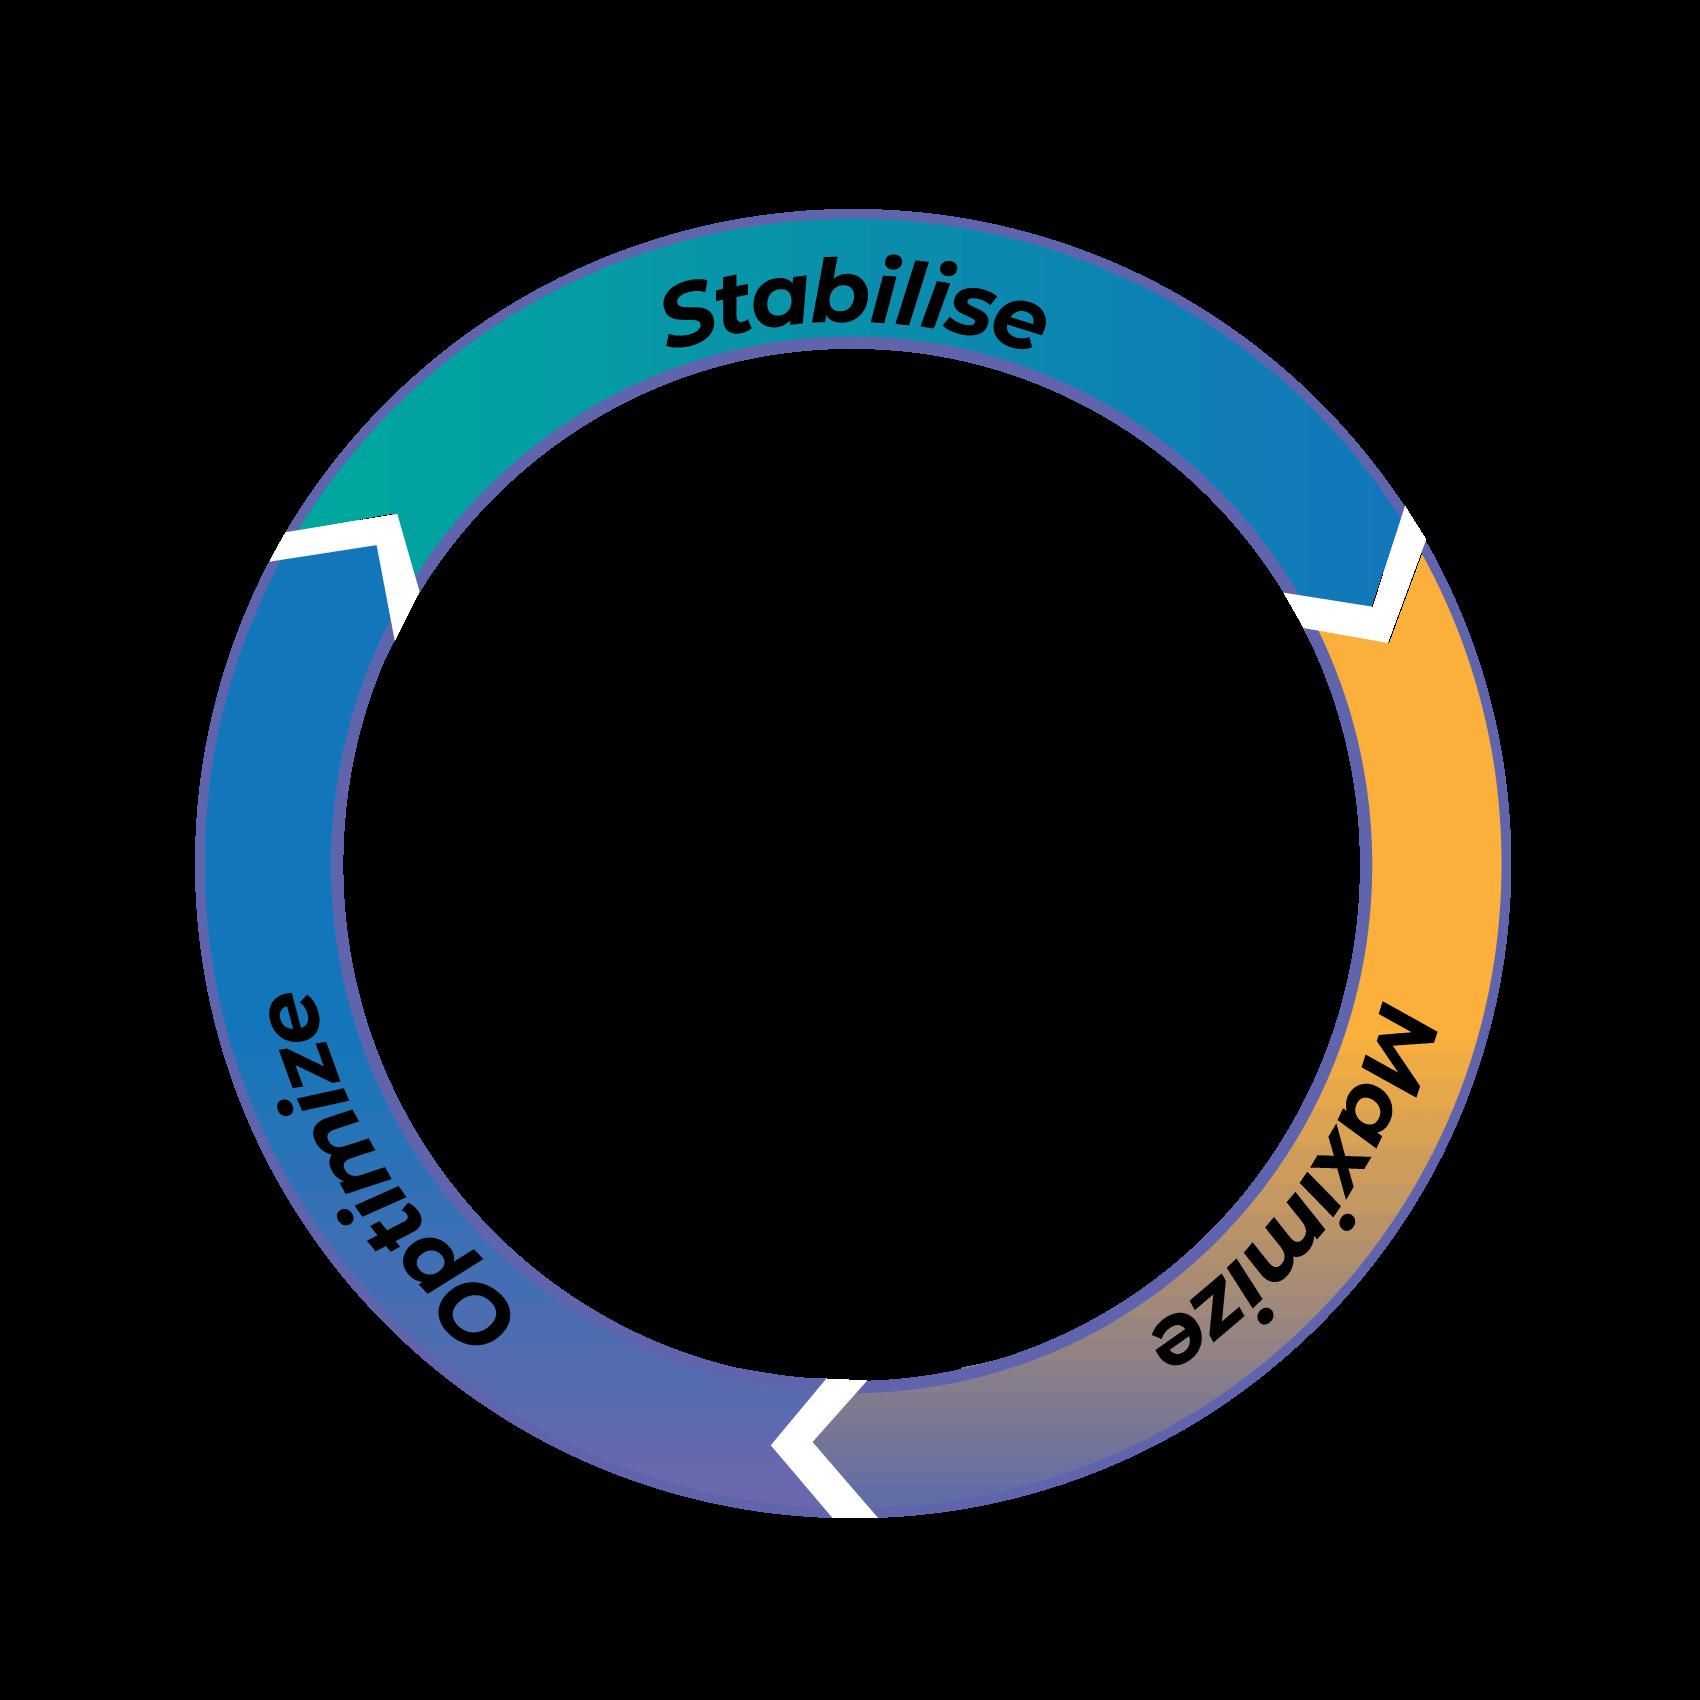 GIB-Process-diagram-stabilise-maximize-optimize